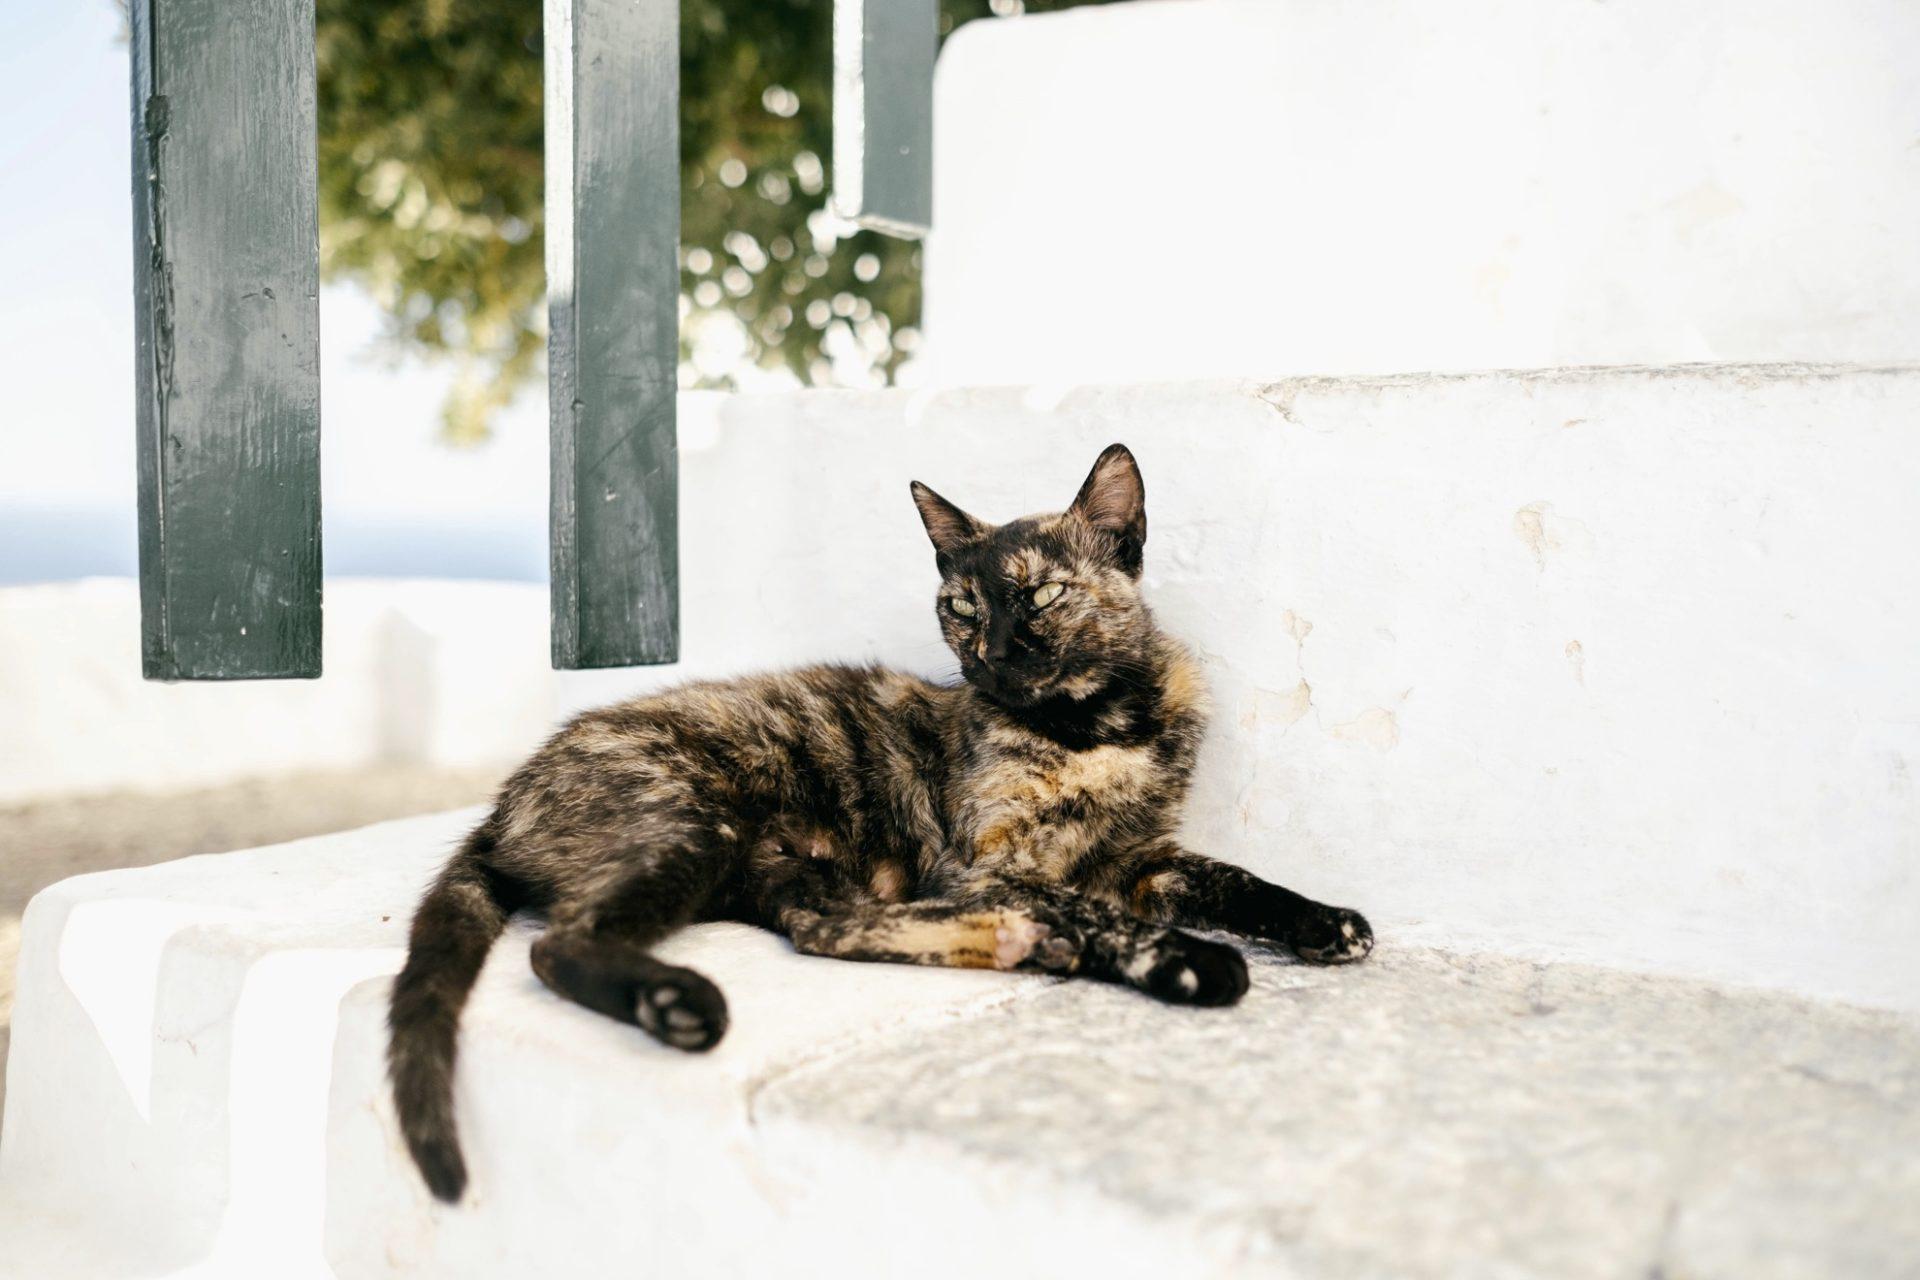 chats grecs@laurentparienti - 14